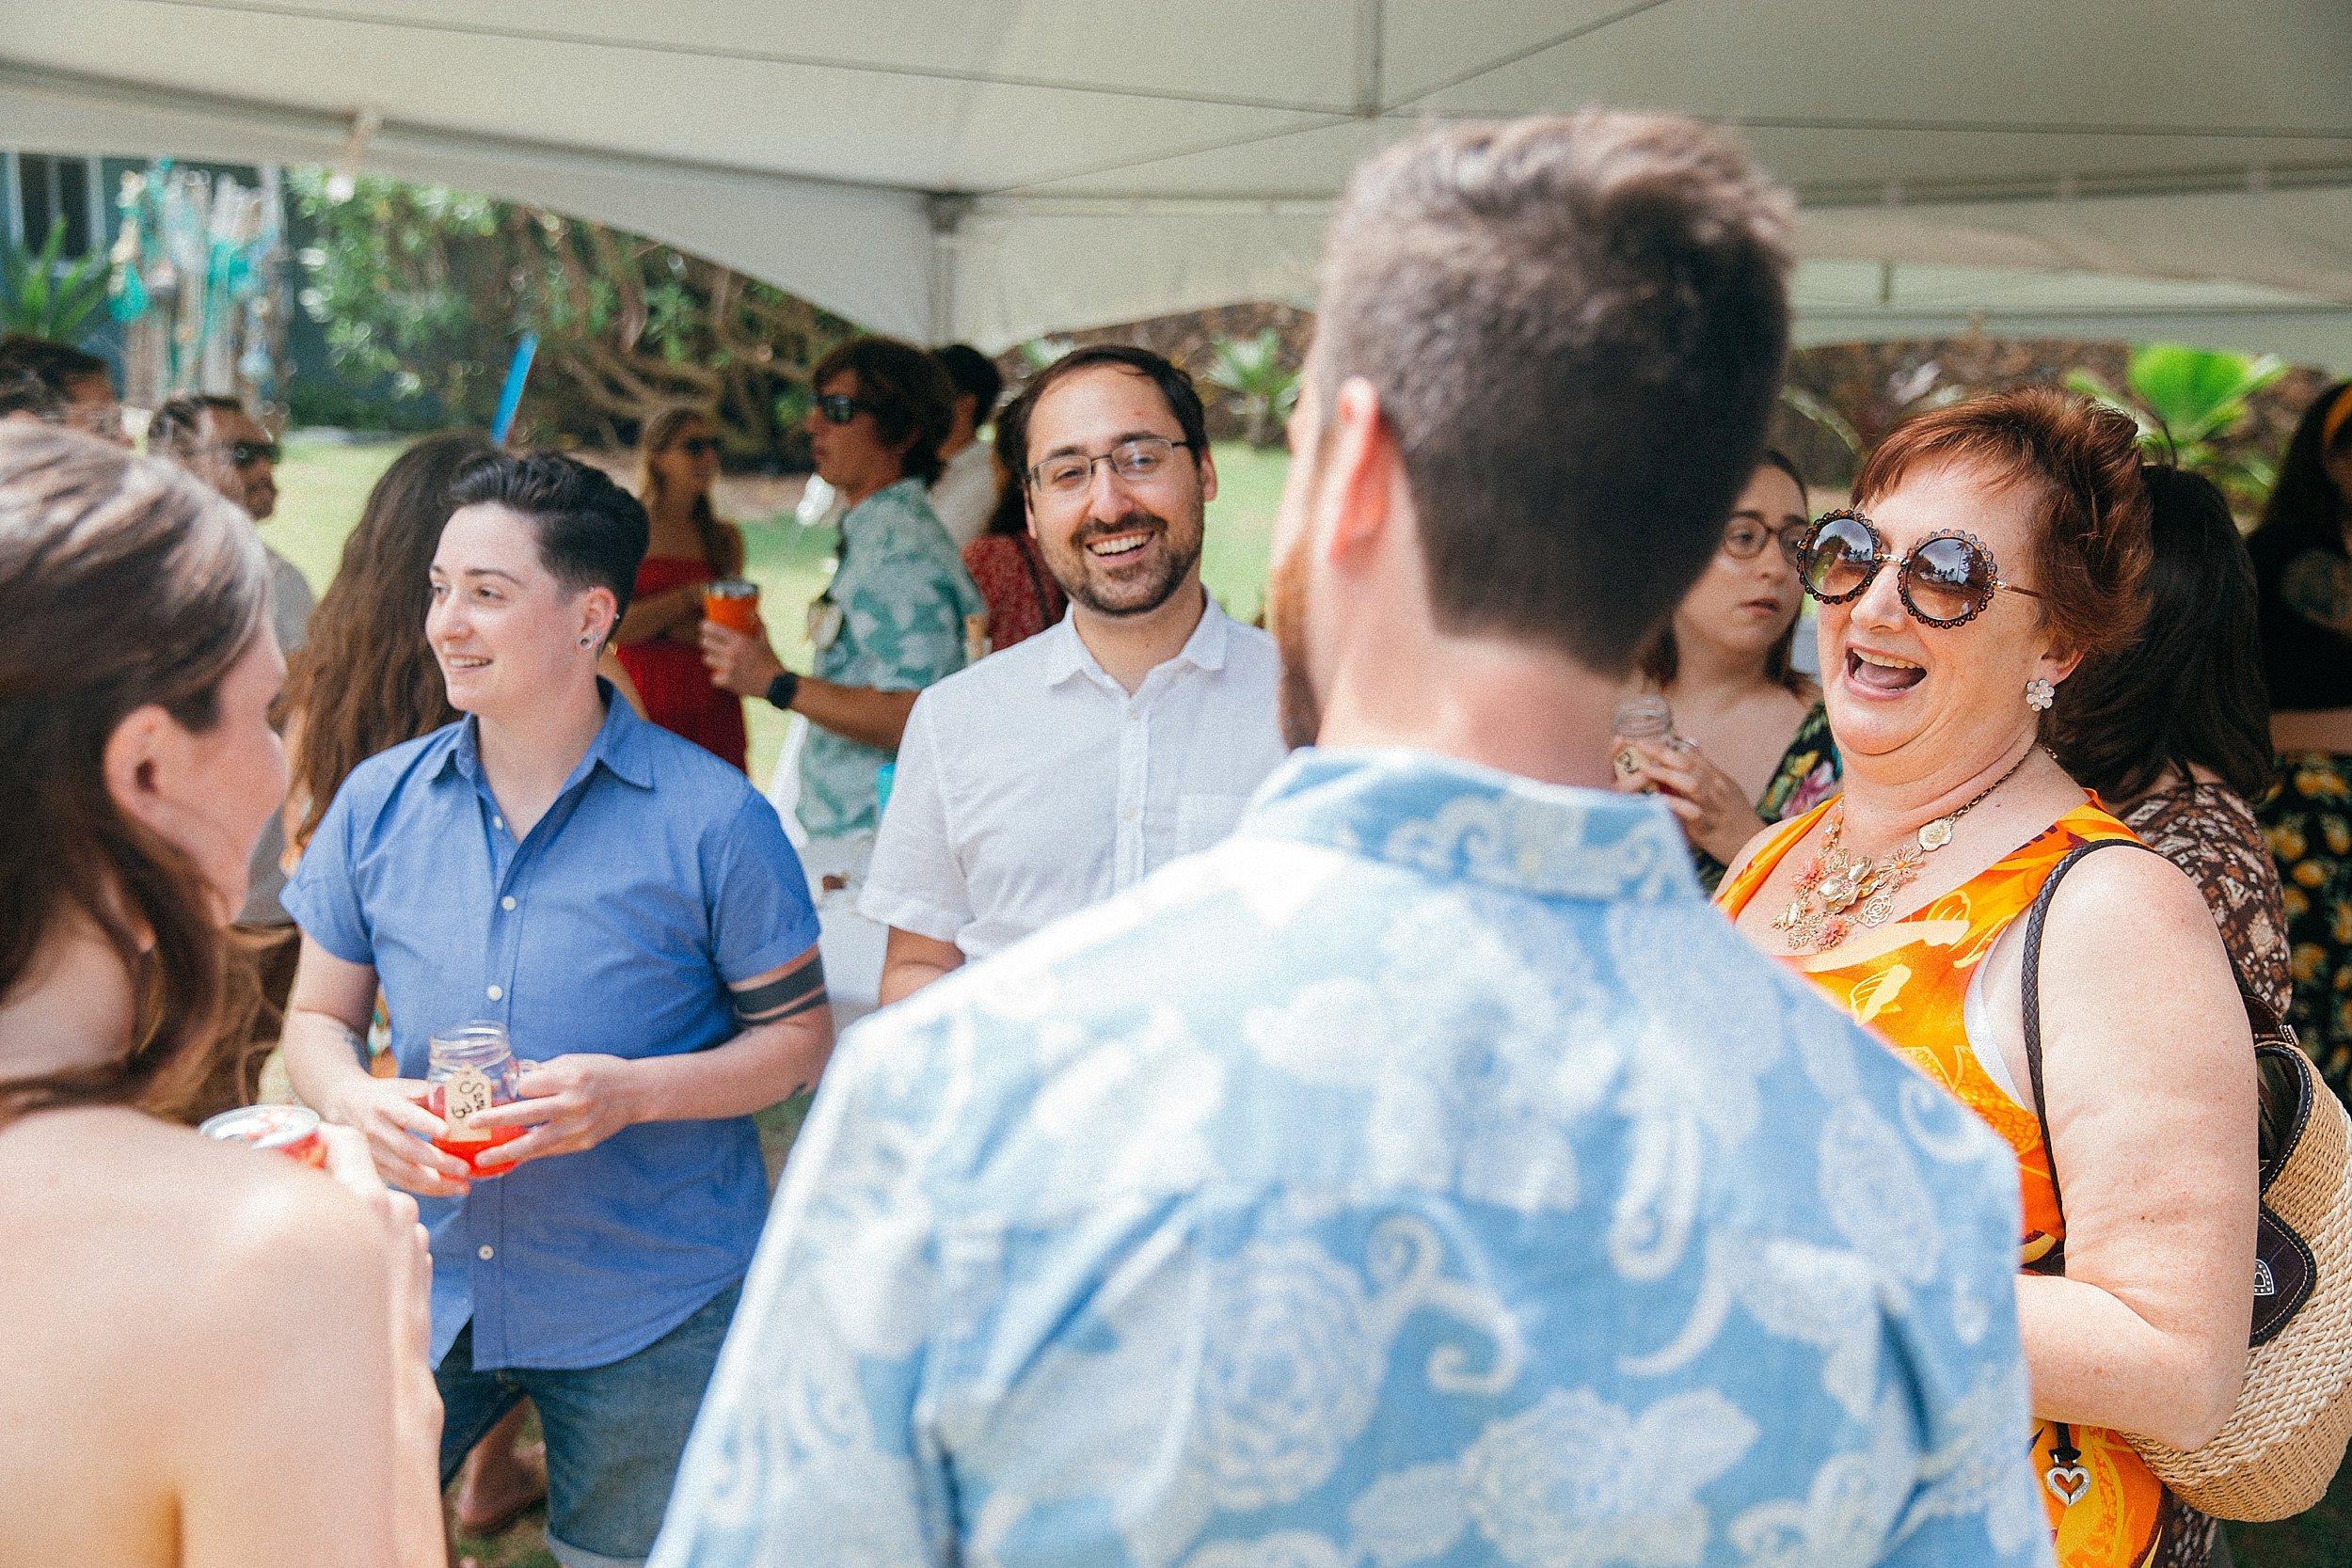 Backyard Hawaii Wedding on Oahu's North Shore - Pounders Beach